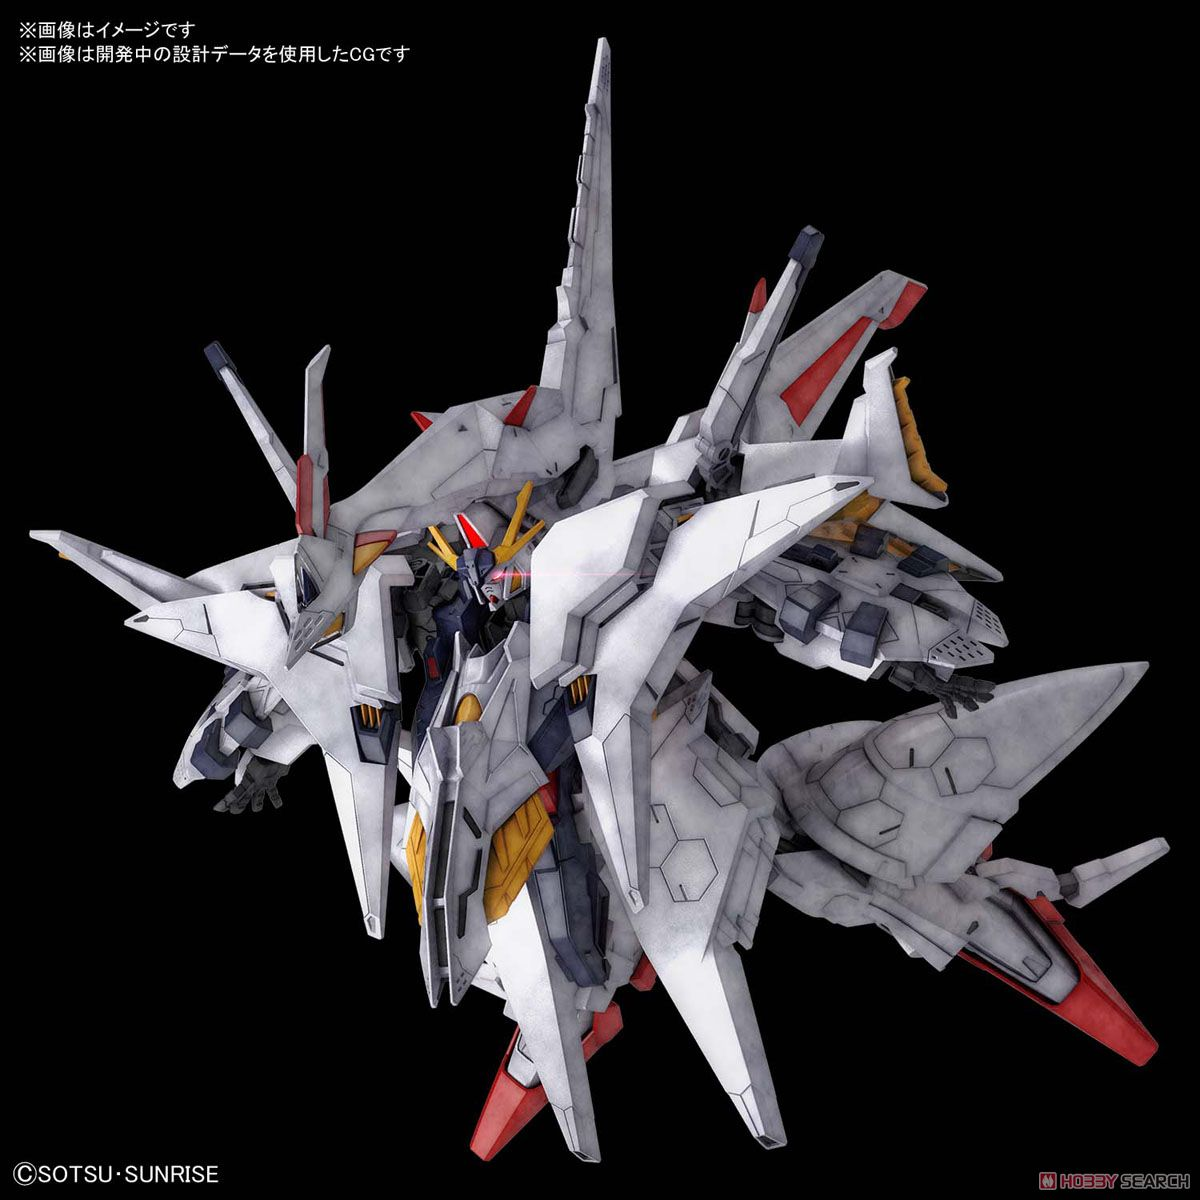 HGUC 1/144『ペーネロペー』機動戦士ガンダム 閃光のハサウェイ プラモデル-018